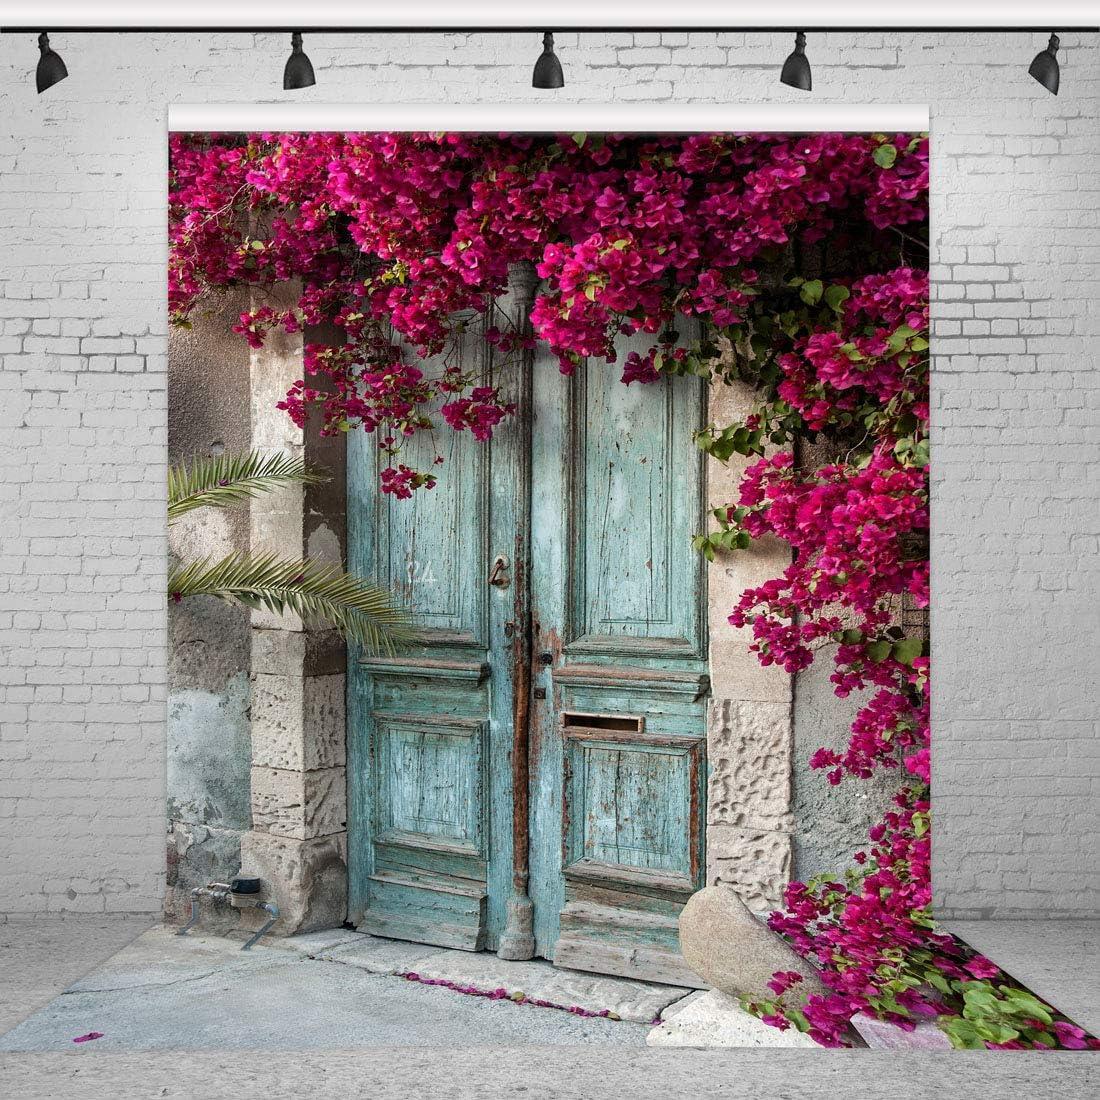 Riyidecor Vintage Blue Wood Door Backdrop Purple Flowers 5x7 Feet Spring Nature House Plant Romantic Wedding Scene Photography Background Adult Party Decor Props Photo Shoot Vinyl Cloth